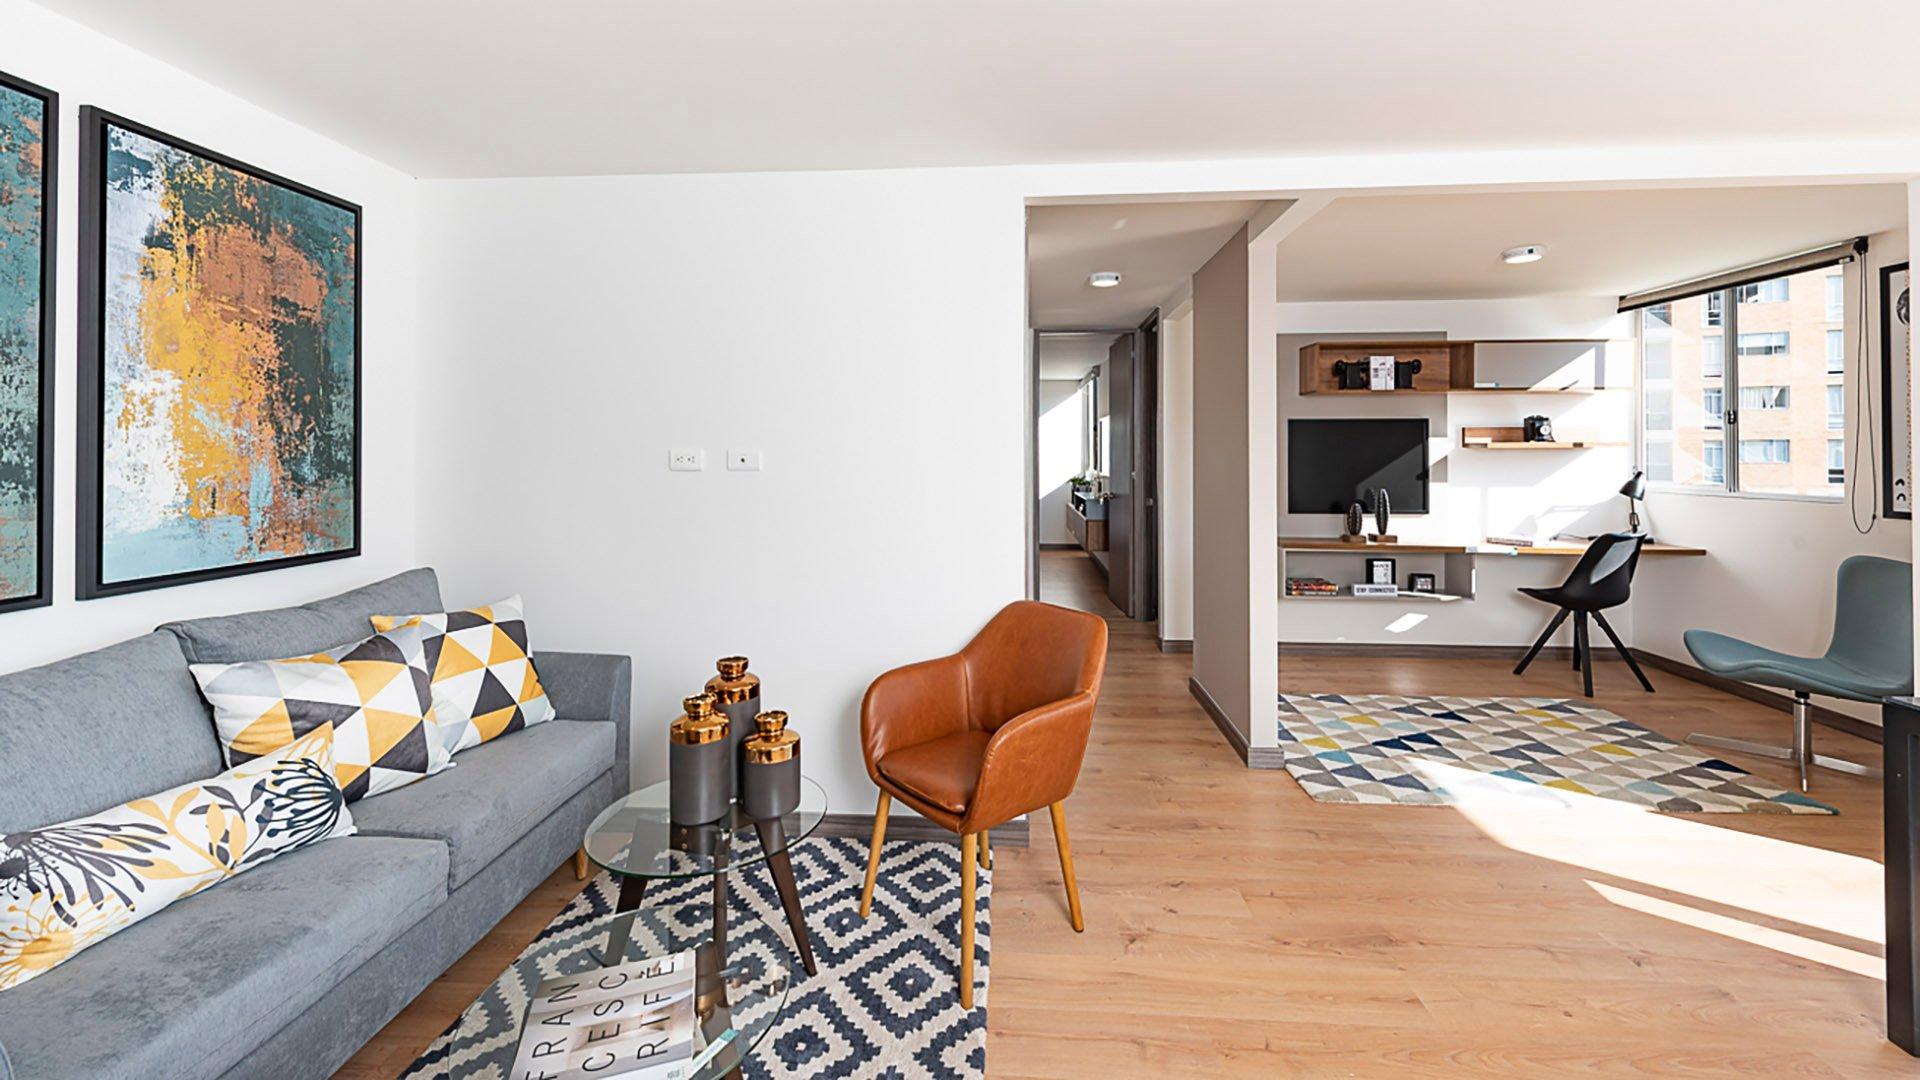 Apartamento-modelo-faroverde-conaltura